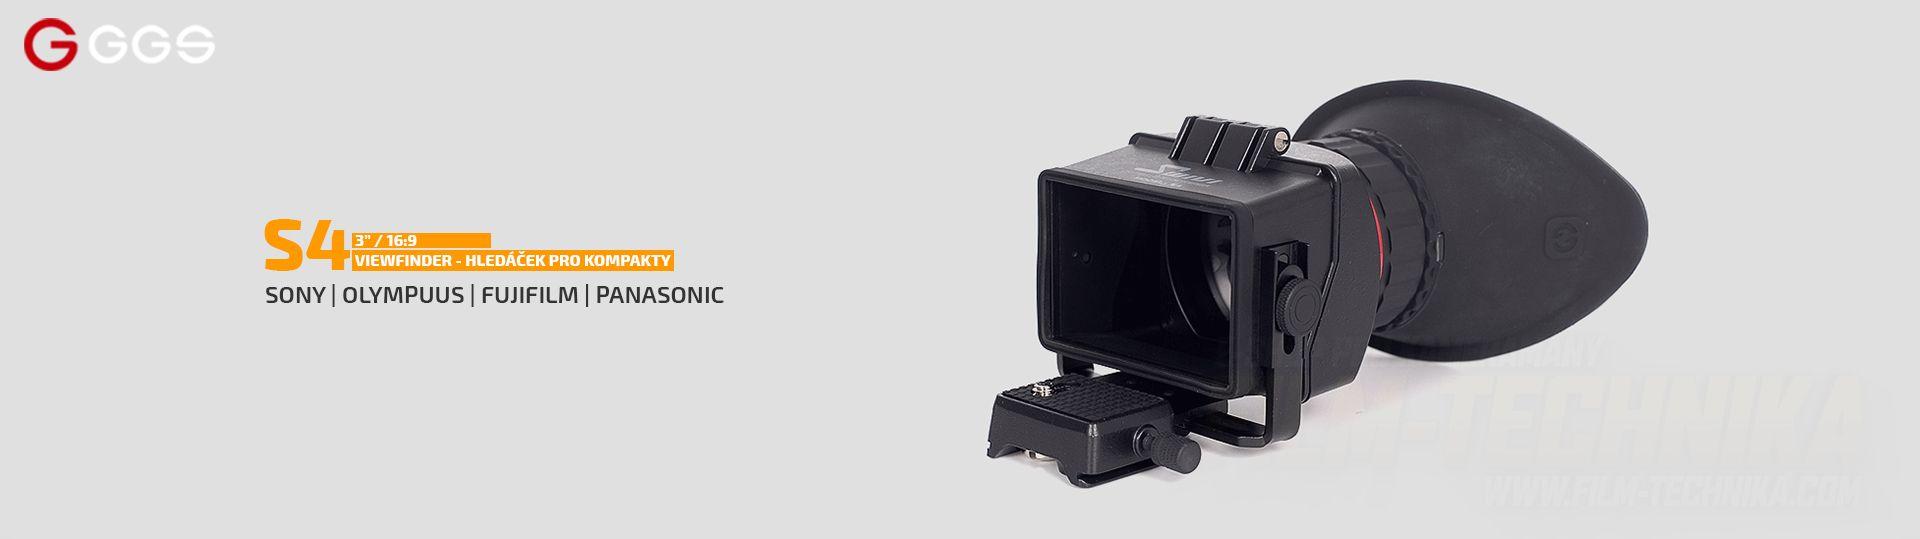 film-technika-ggs-s4-intetx2